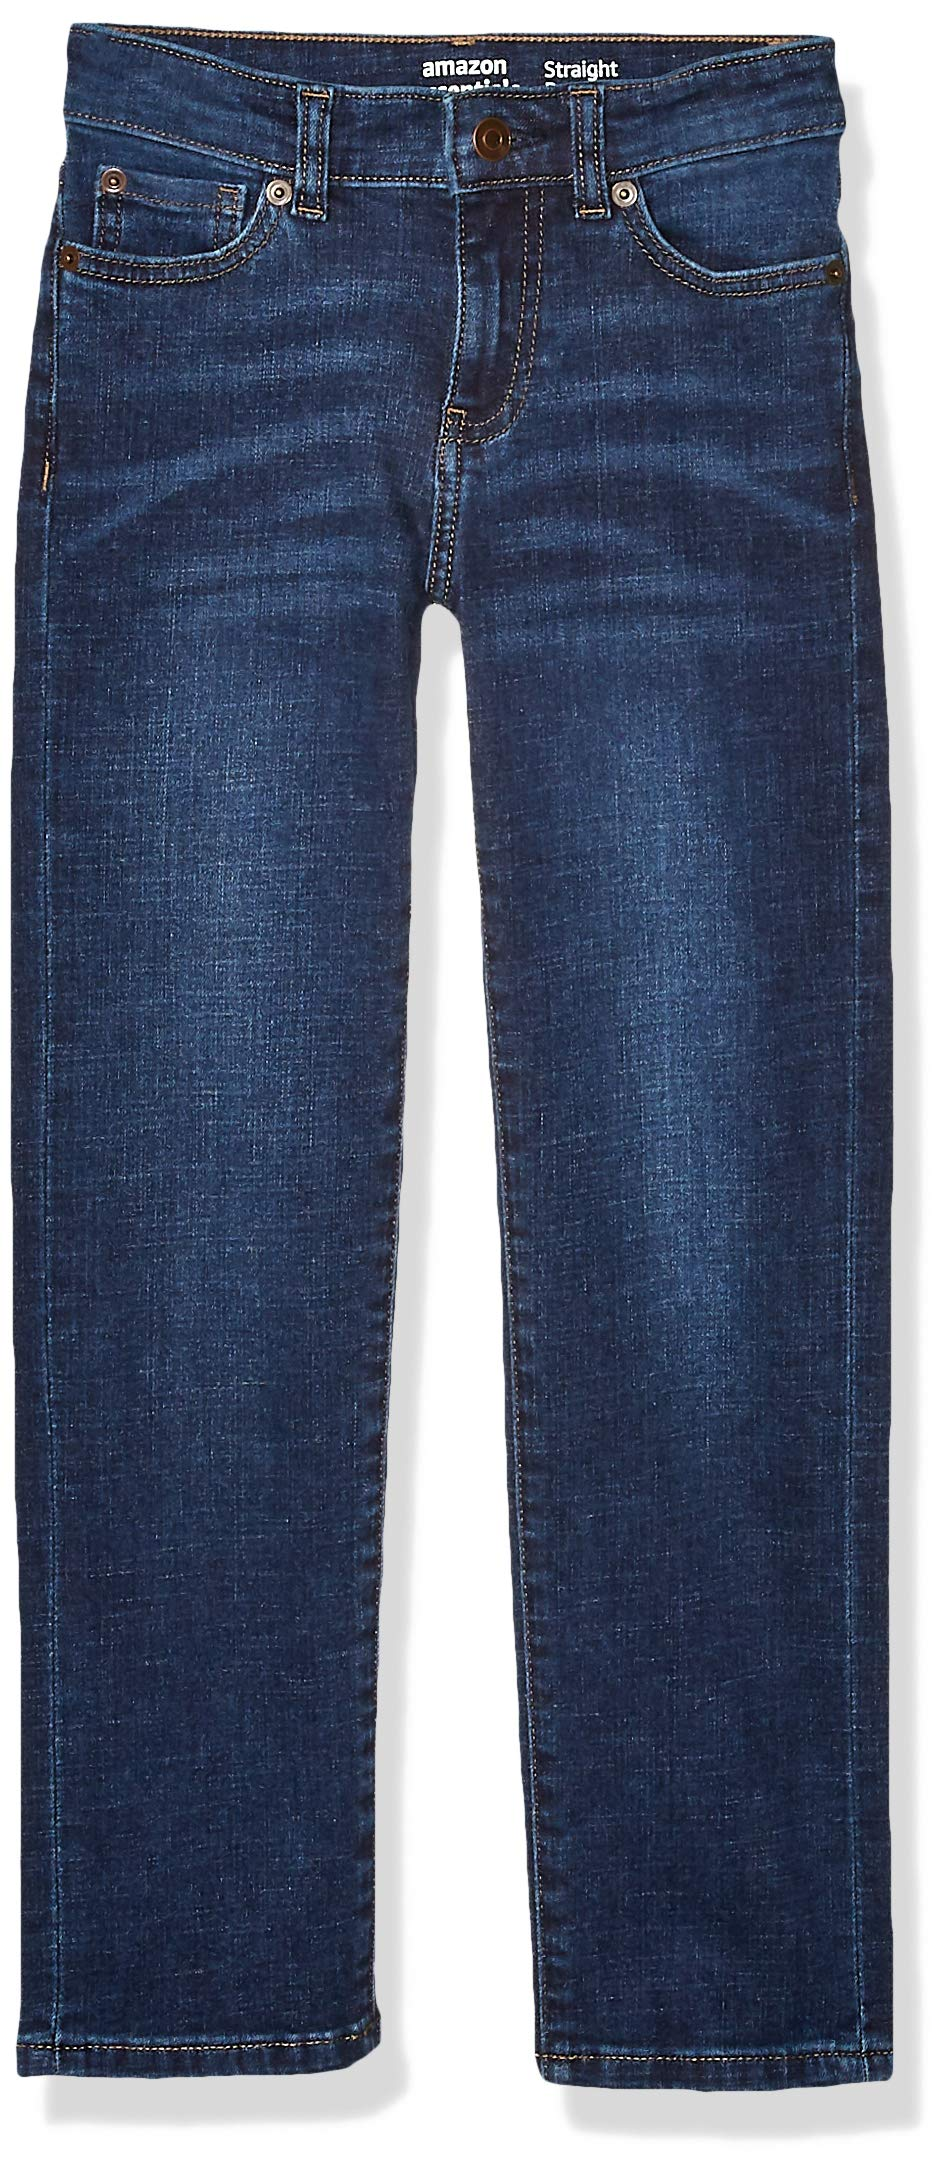 Amazon Essentials Kids Boys Stretch Straight-Fit Jeans, Kumo Dark Wash, 10 Husky